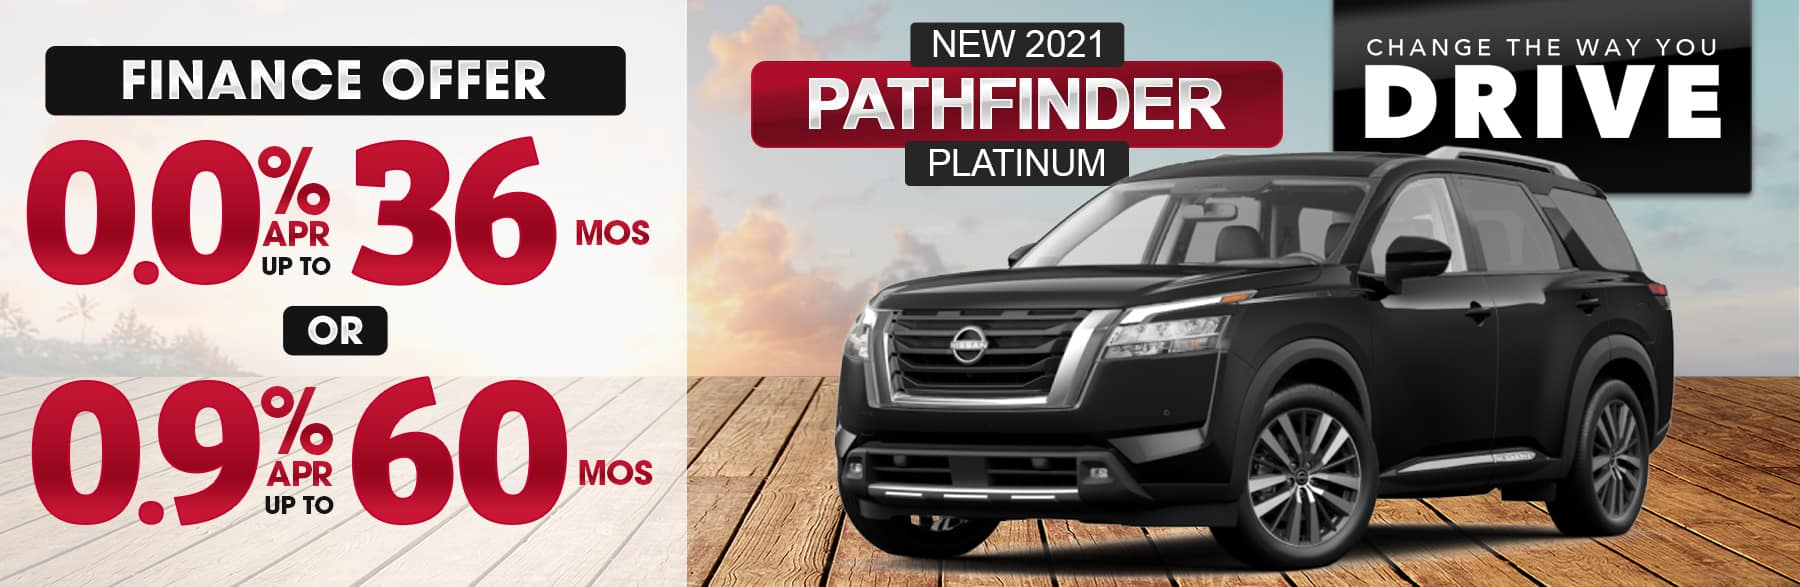 EPN-Sep21-HP-Pathfinder-vUpdated